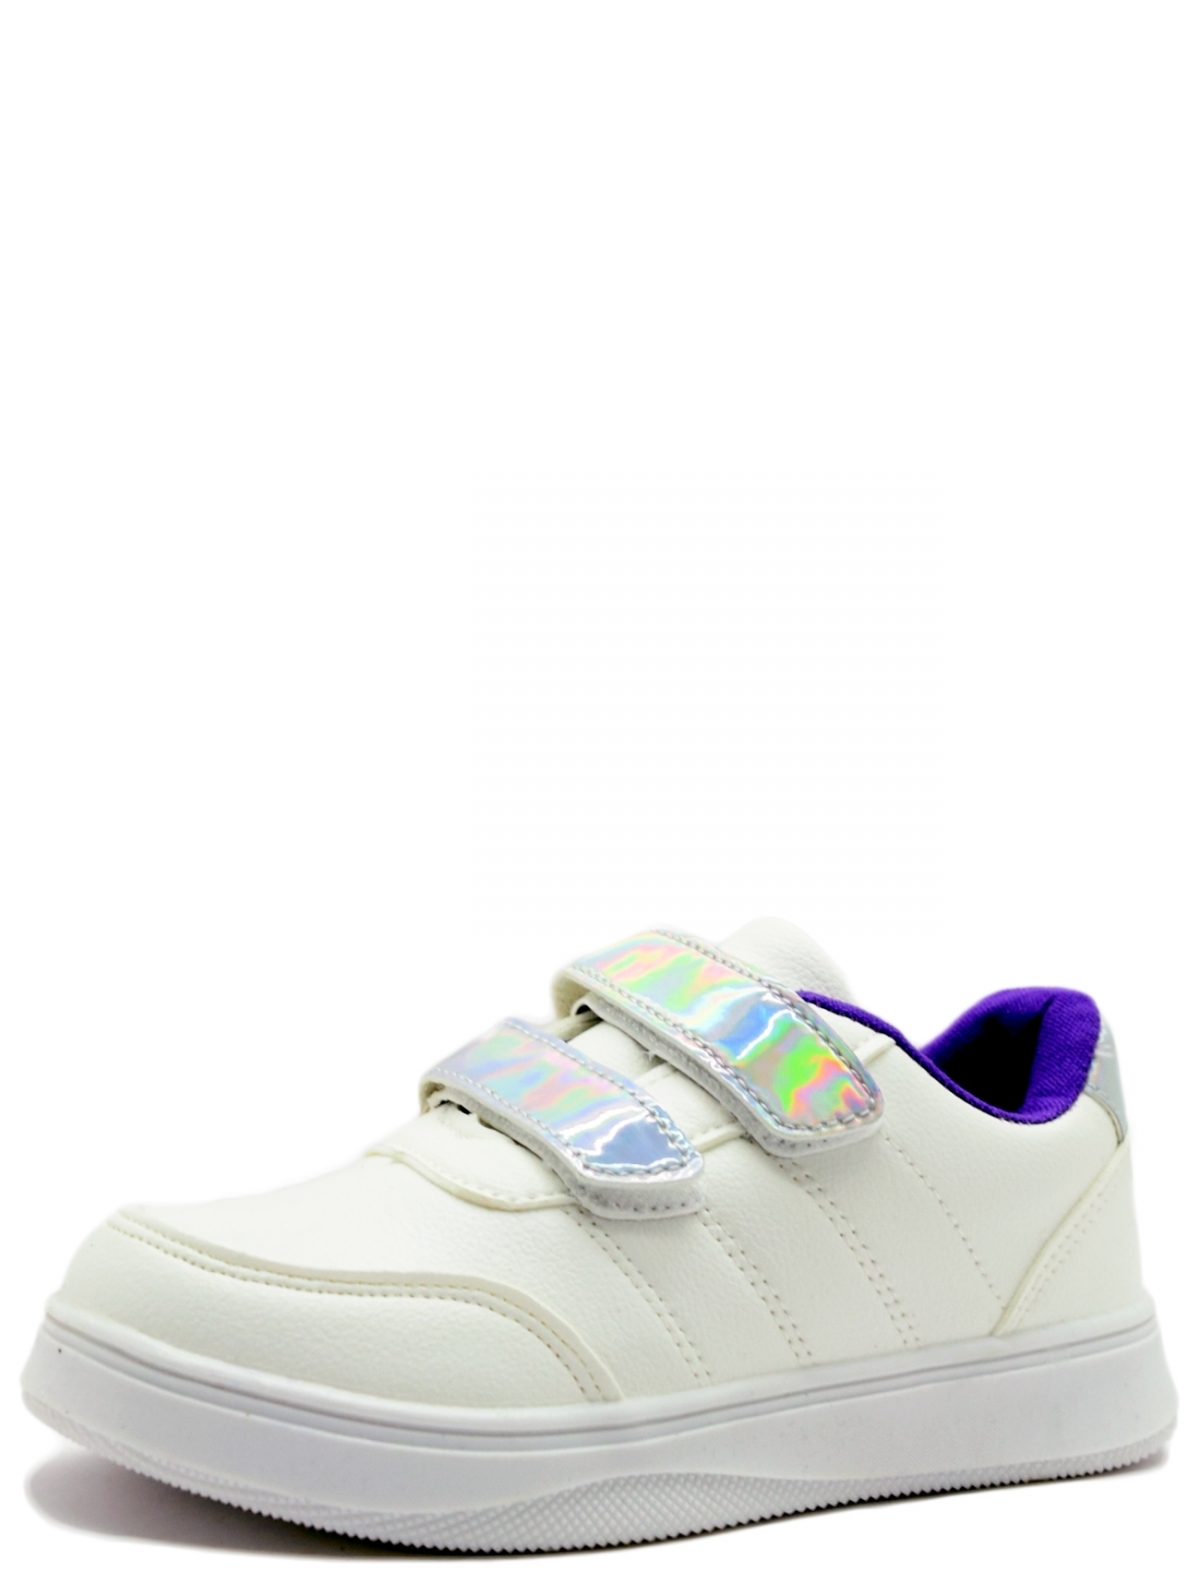 Trien 9JYR-26 кроссовки для девочки